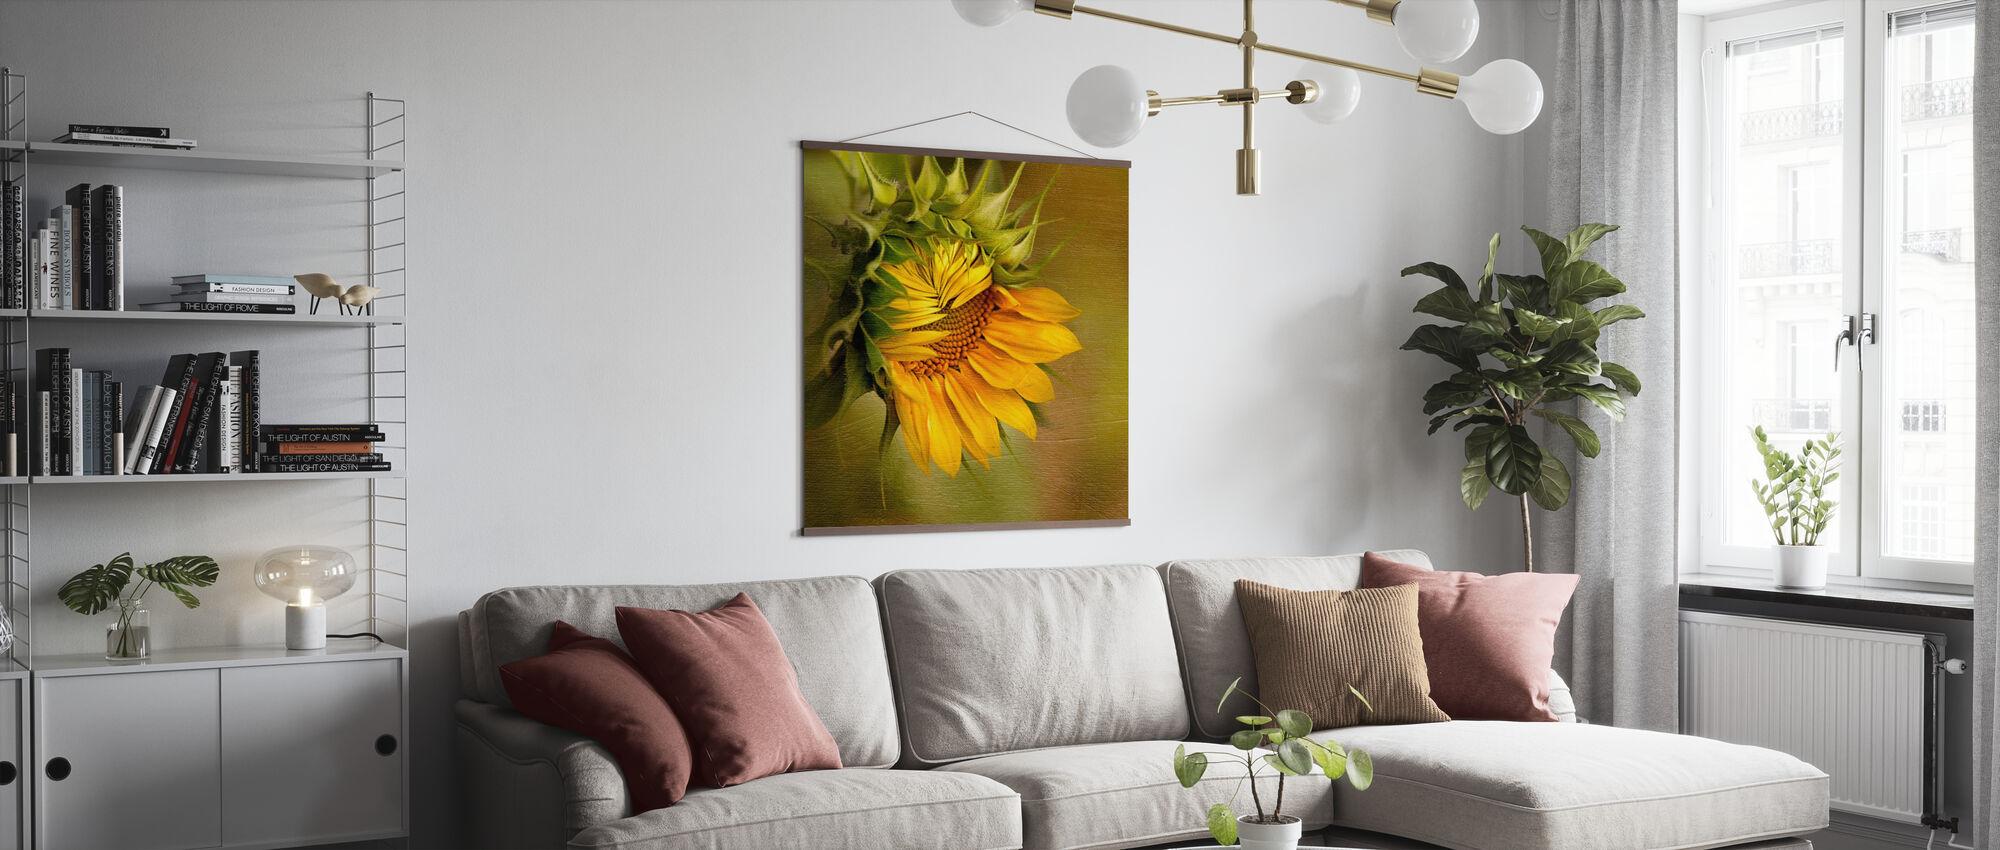 Summer's Beauty - Poster - Living Room